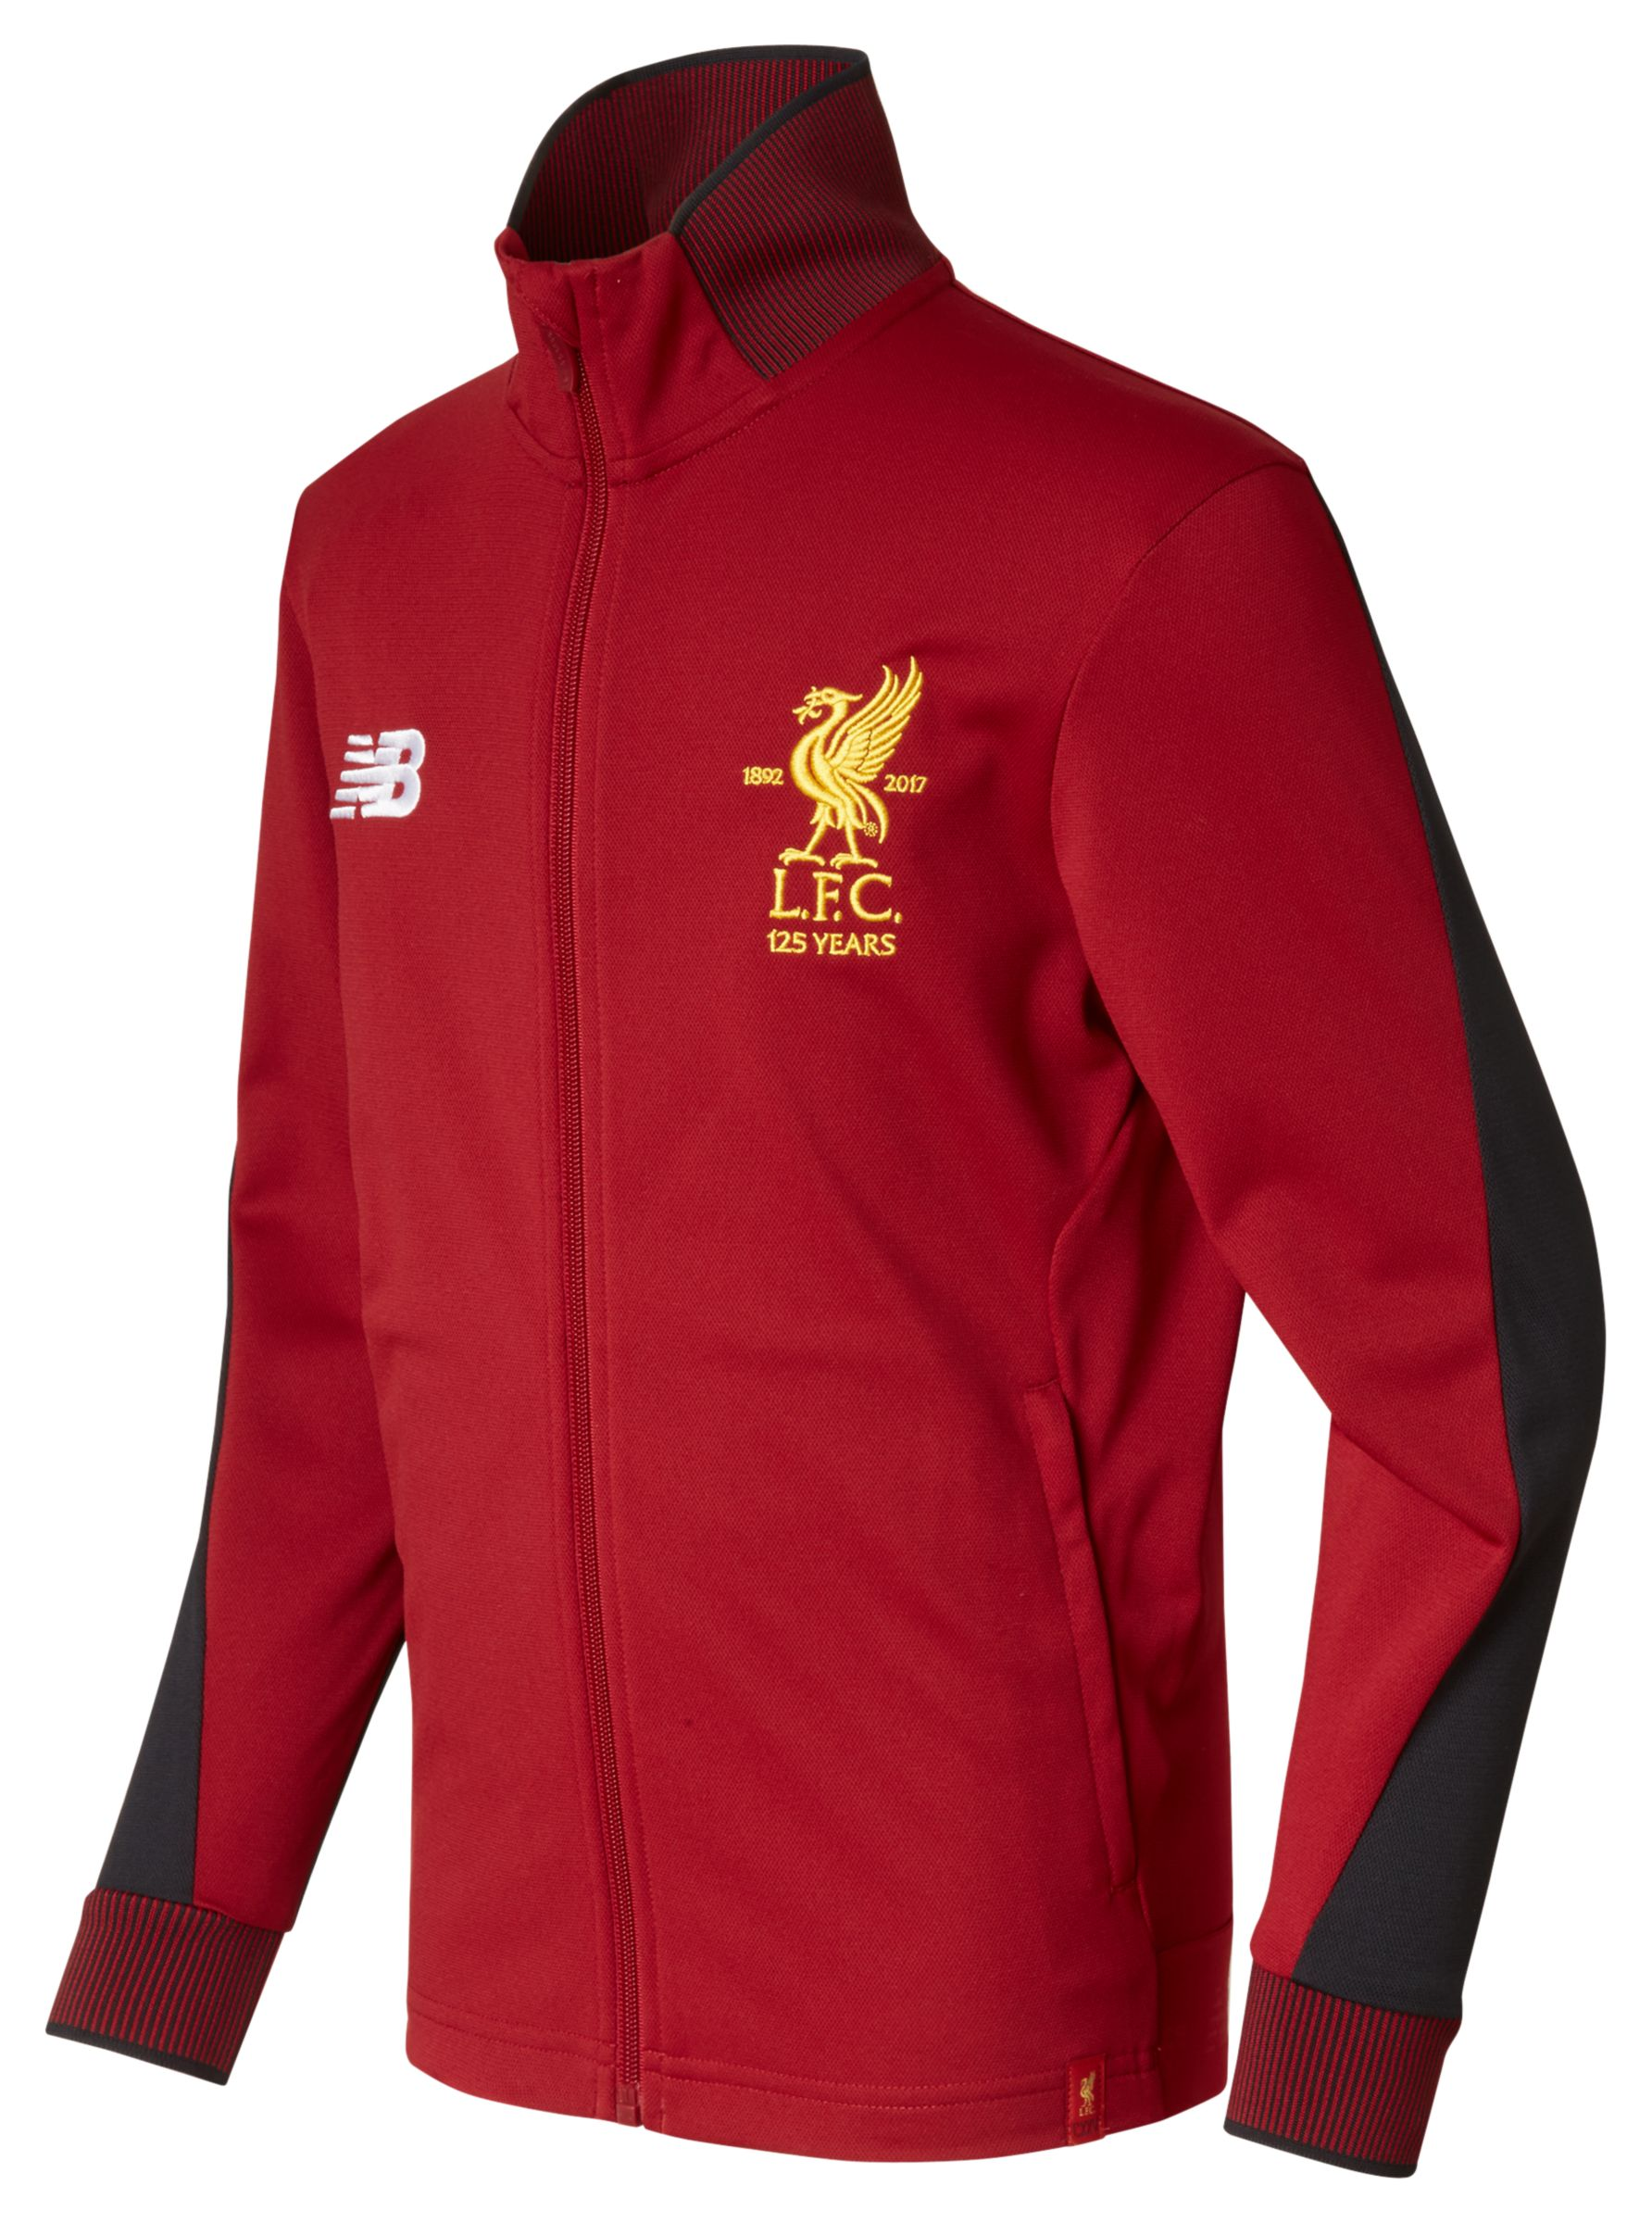 NB LFC Elite Training Junior Presentation Jacket, Red Pepper